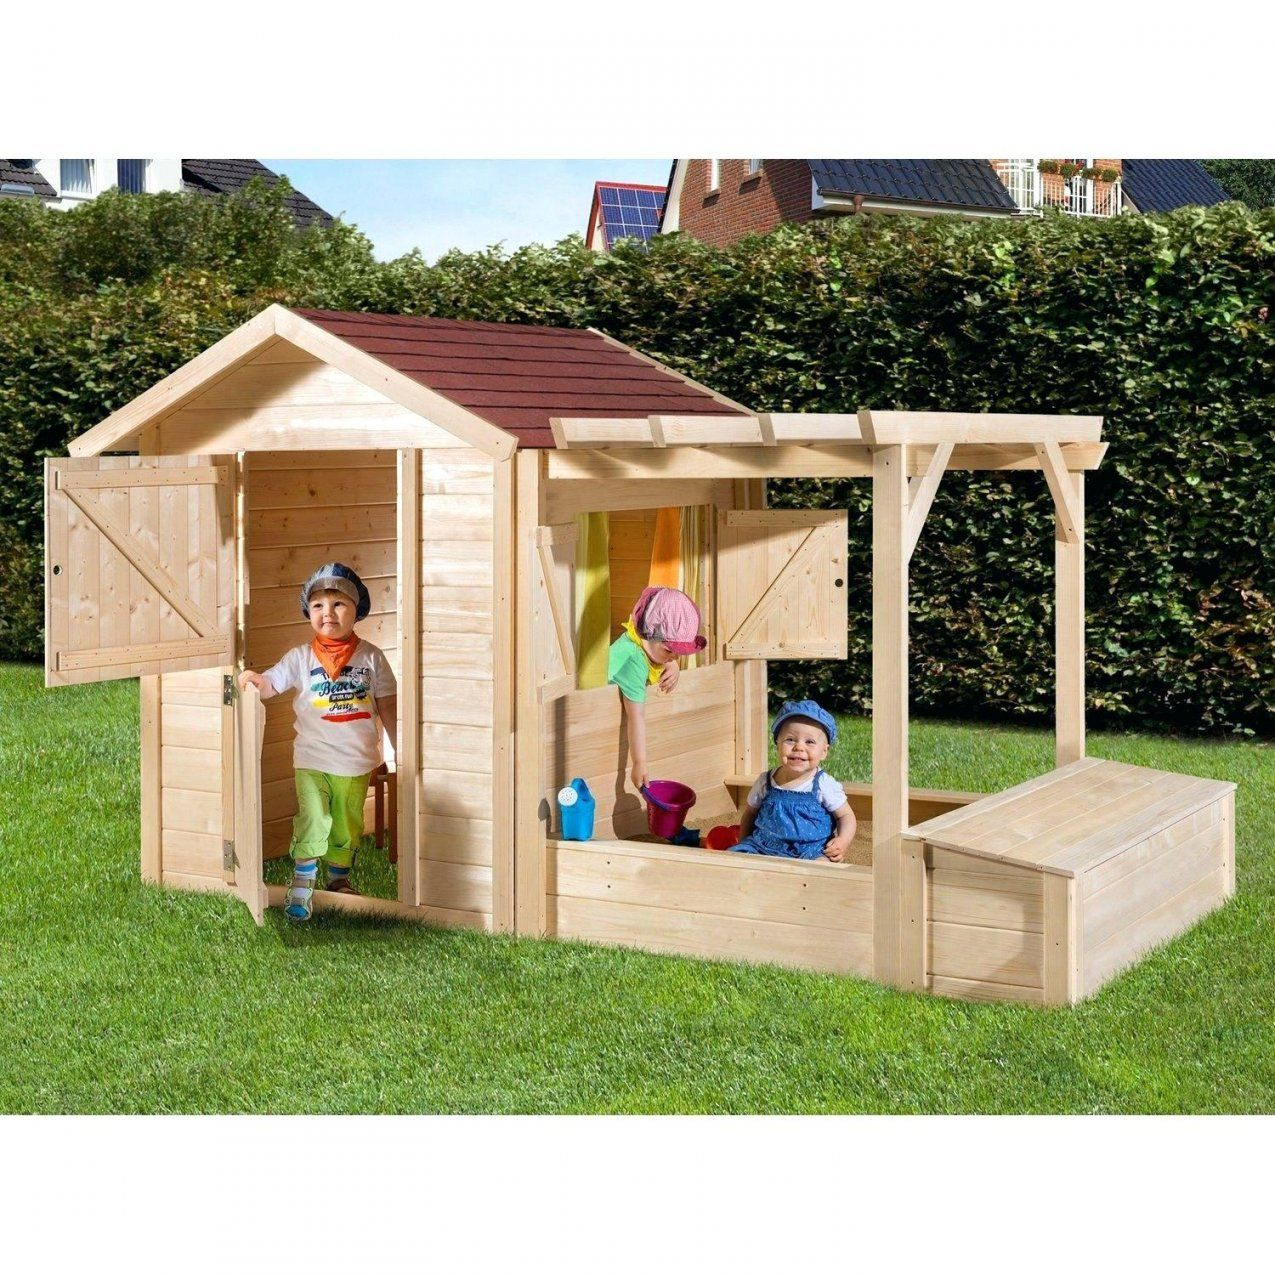 Spielhaus Fur Den Garten Holz Gebraucht Selber Bauen Spielhauser von Holz Spielhaus Selber Bauen Photo